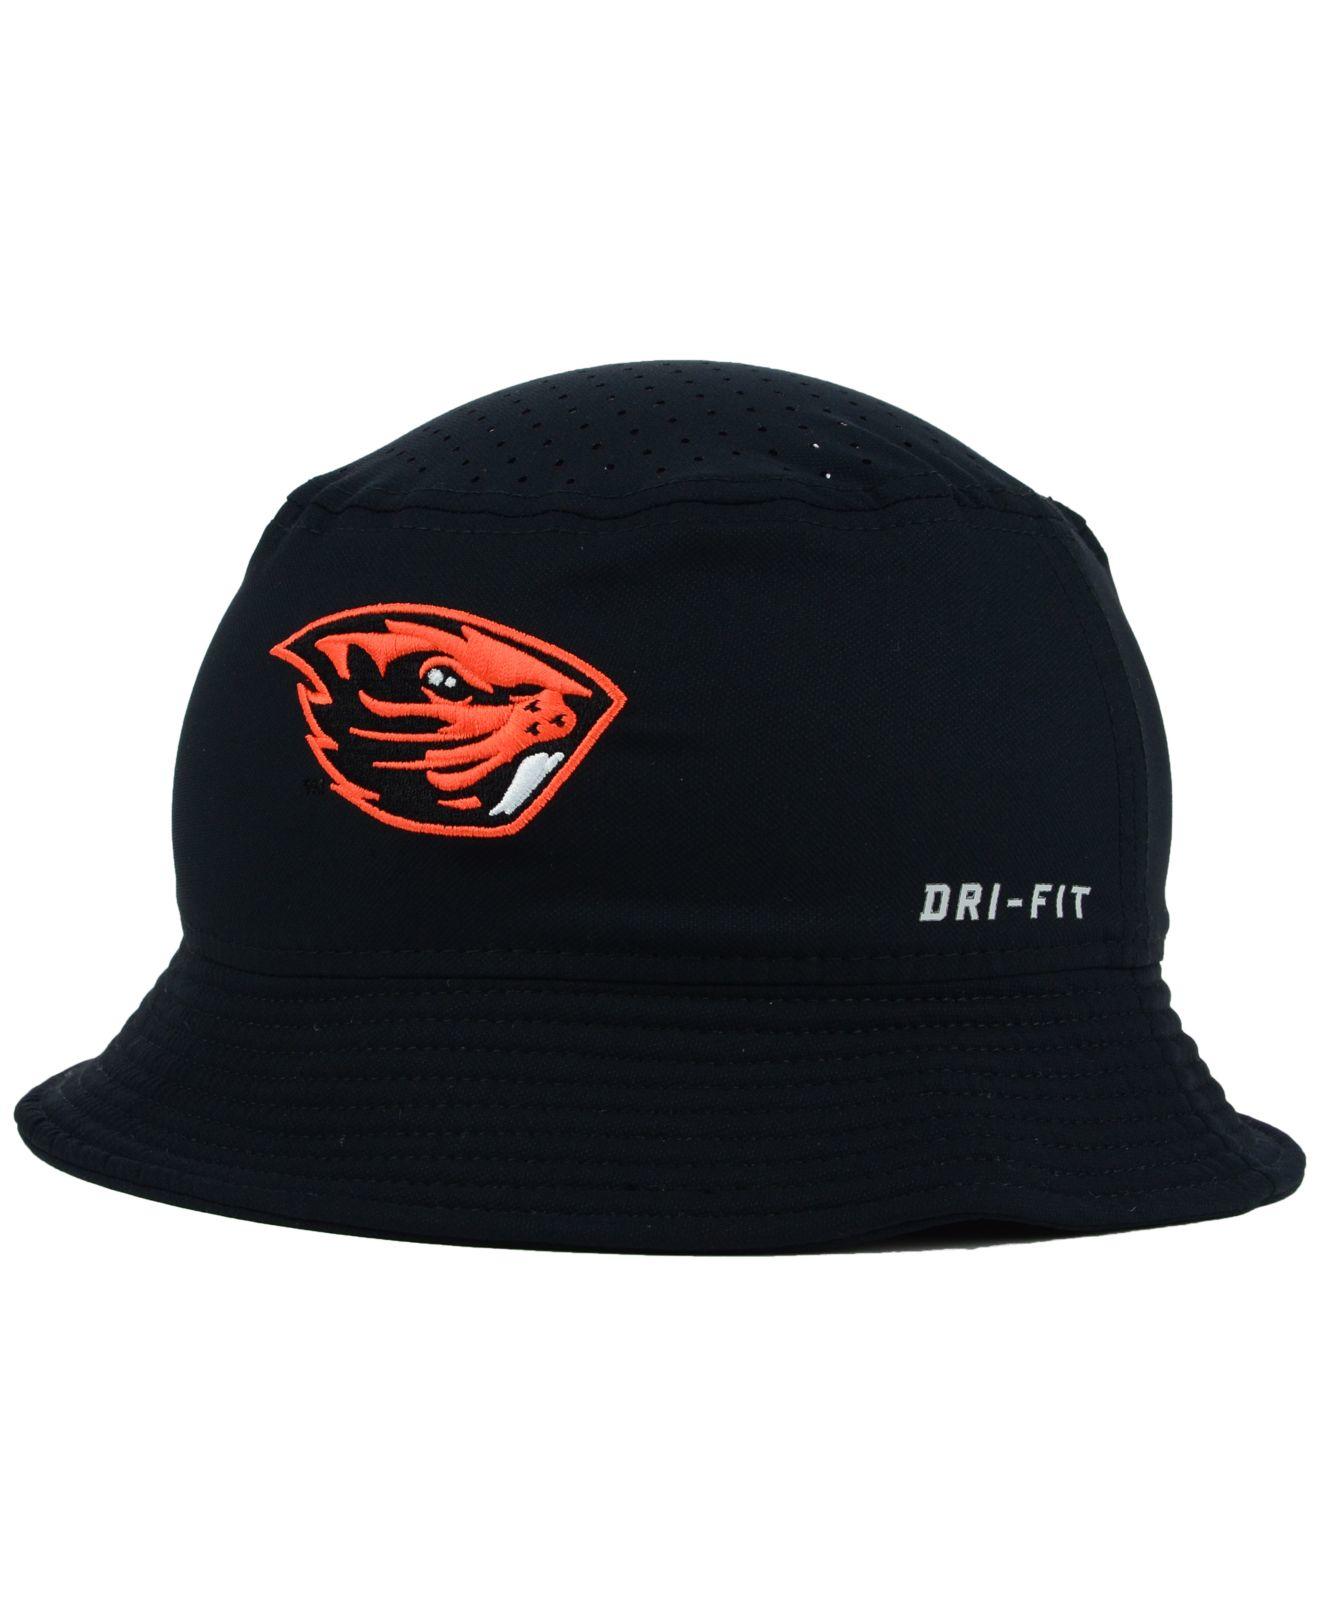 da8548ba3a9e3 ... discount code for lyst nike oregon state beavers vapor bucket hat in  black for men 4b9a5